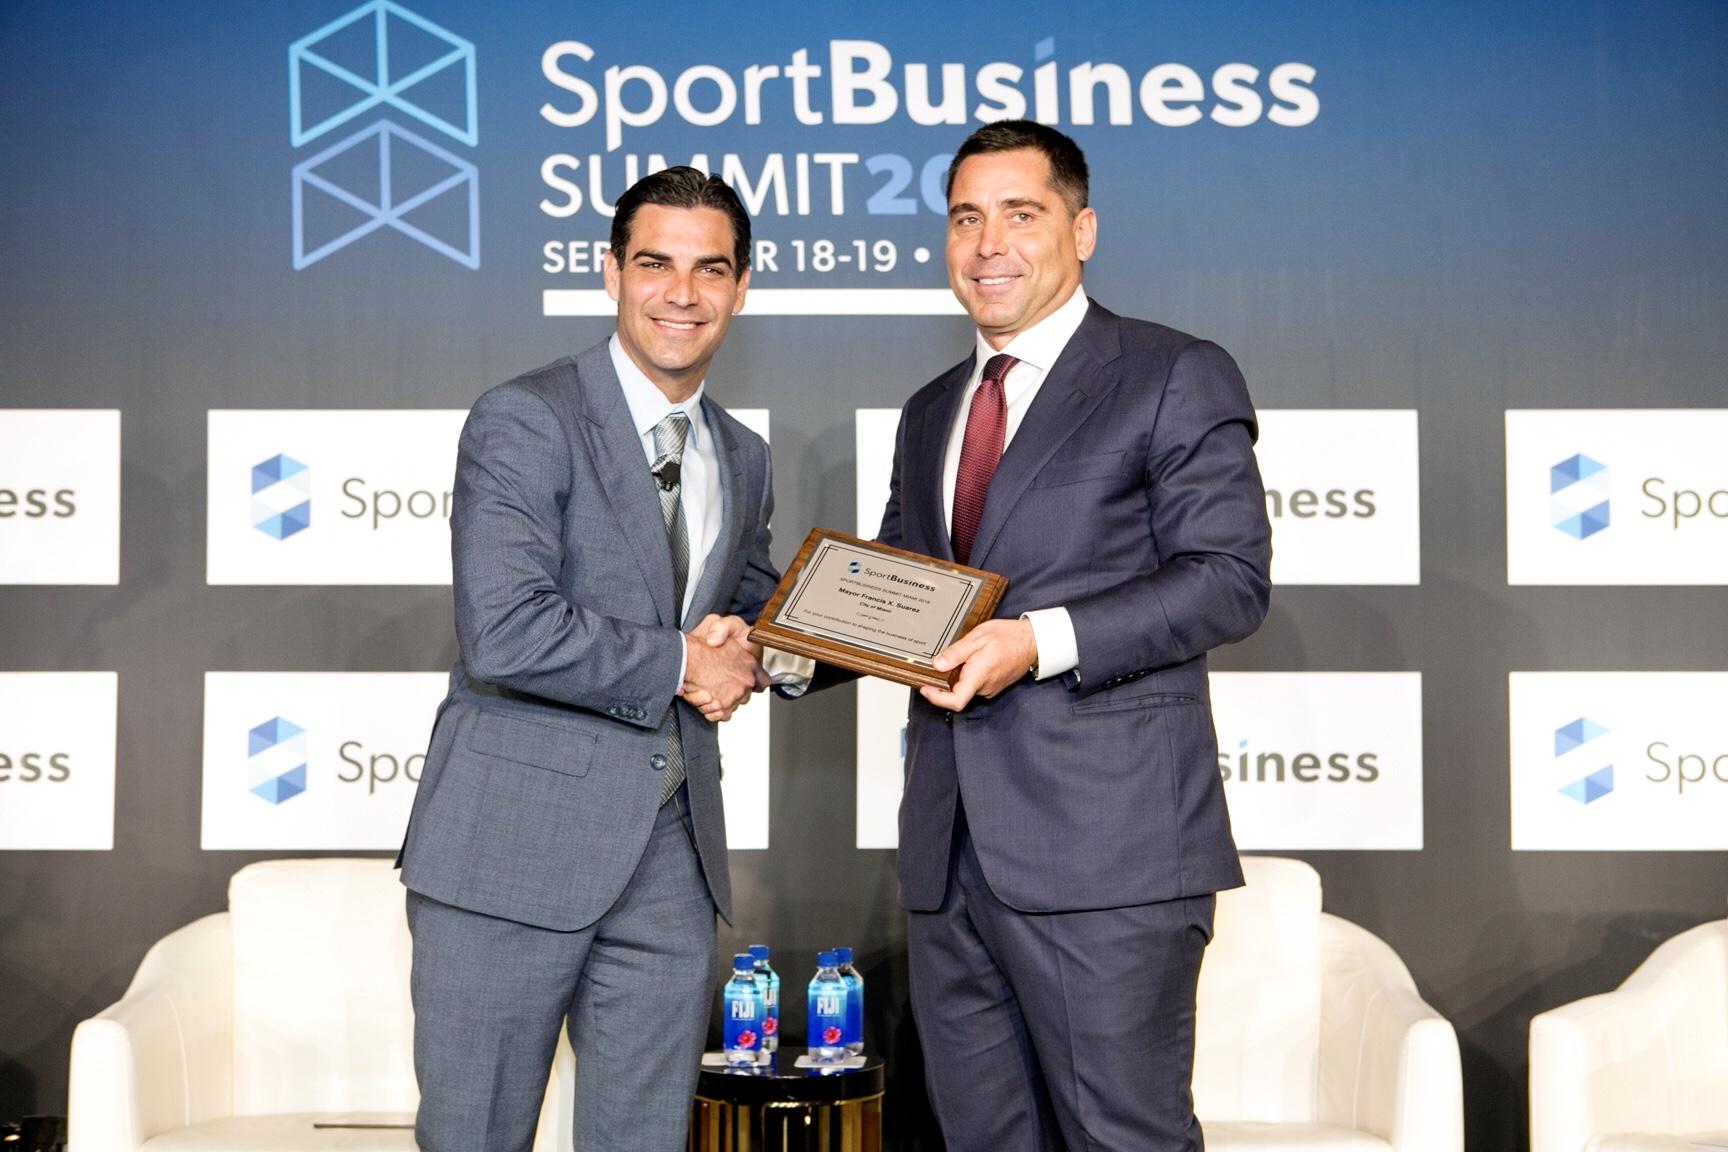 Riccardo Silva and Francis X Suarez, the Mayor of Miami at the SportBusiness Summit 2018